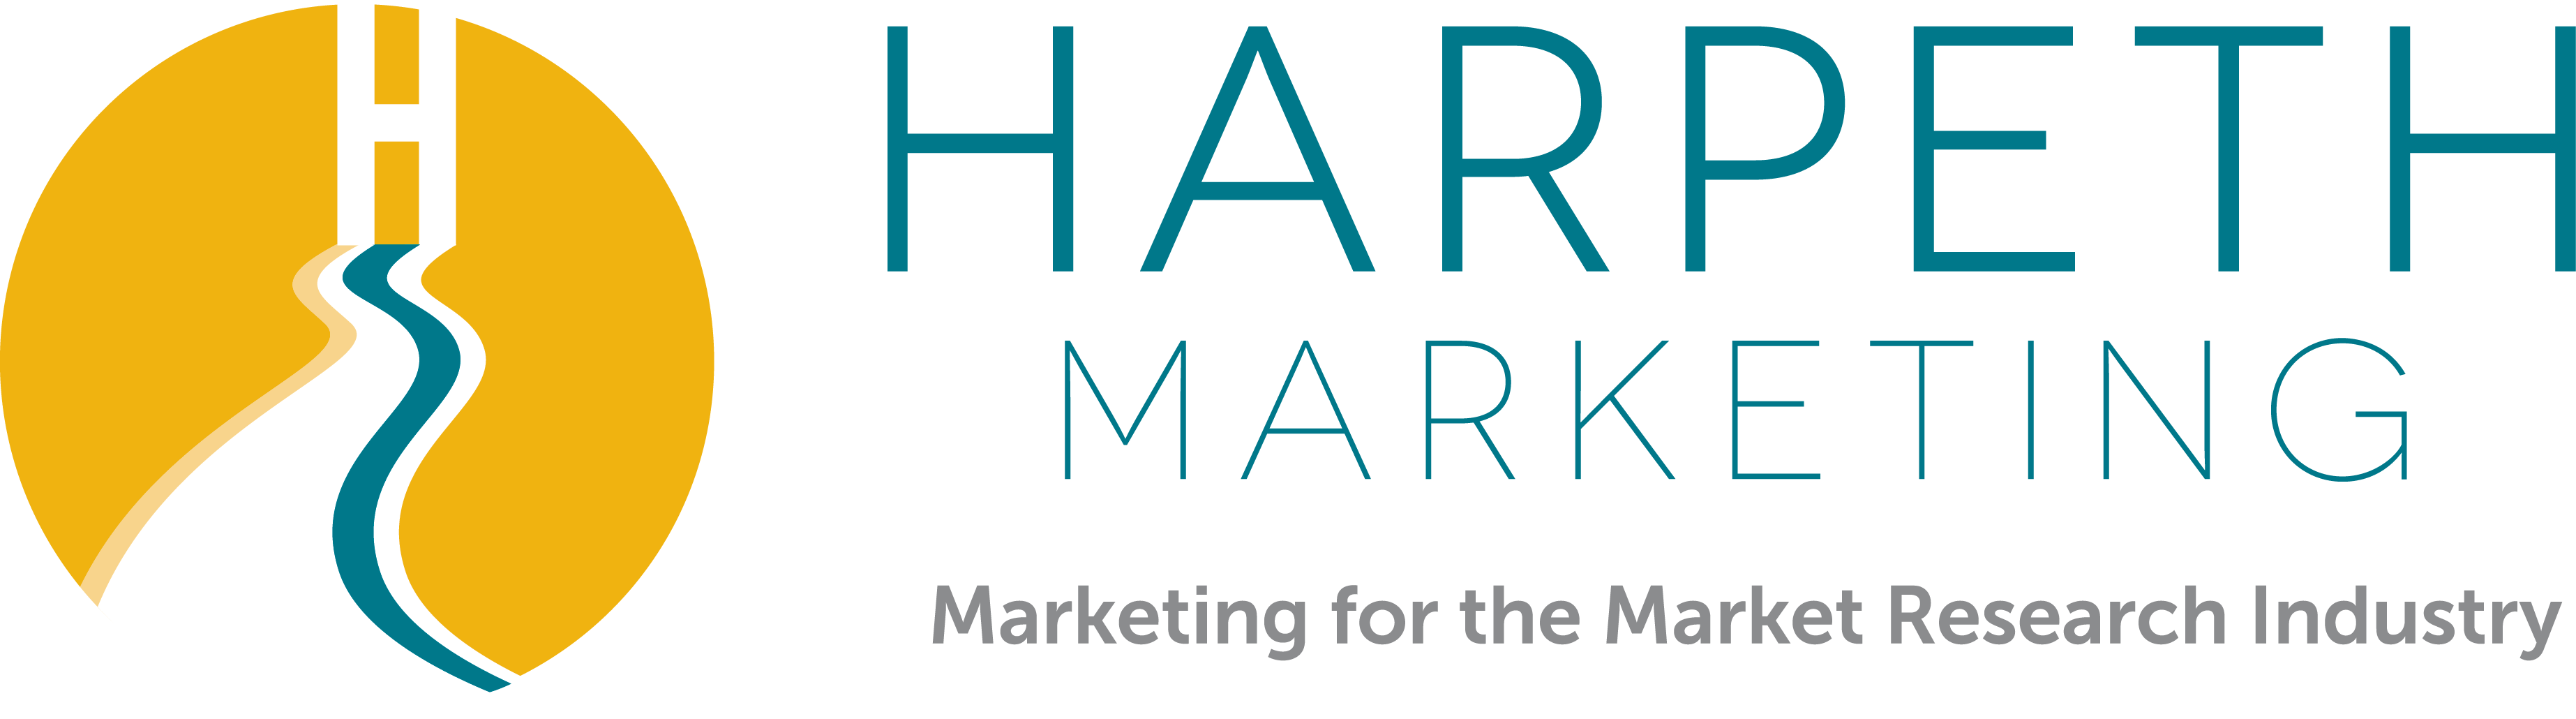 Harpeth Marketing